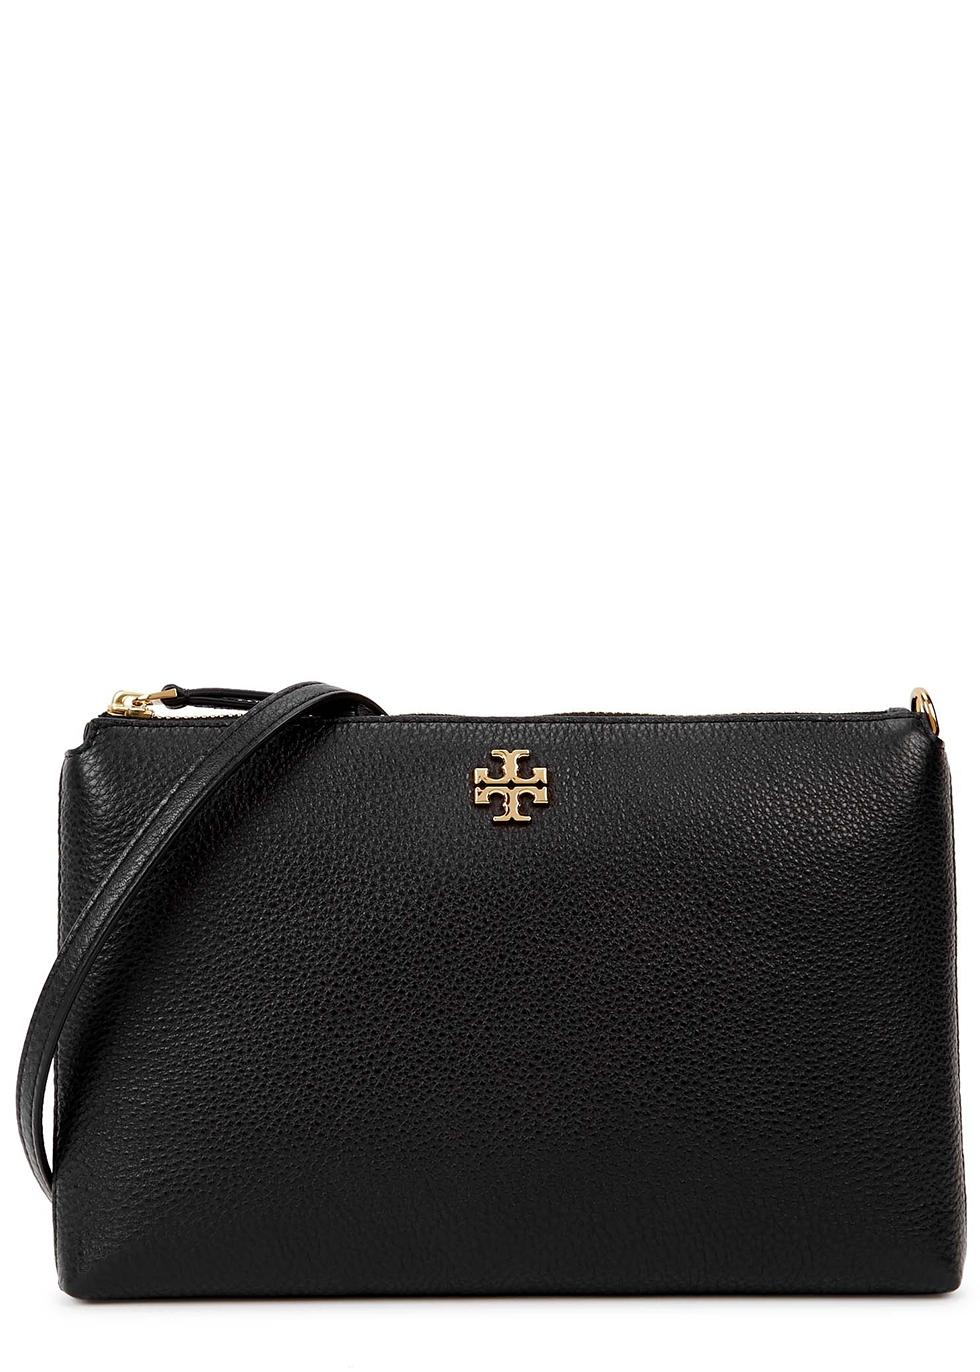 Kira black leather cross-body bag